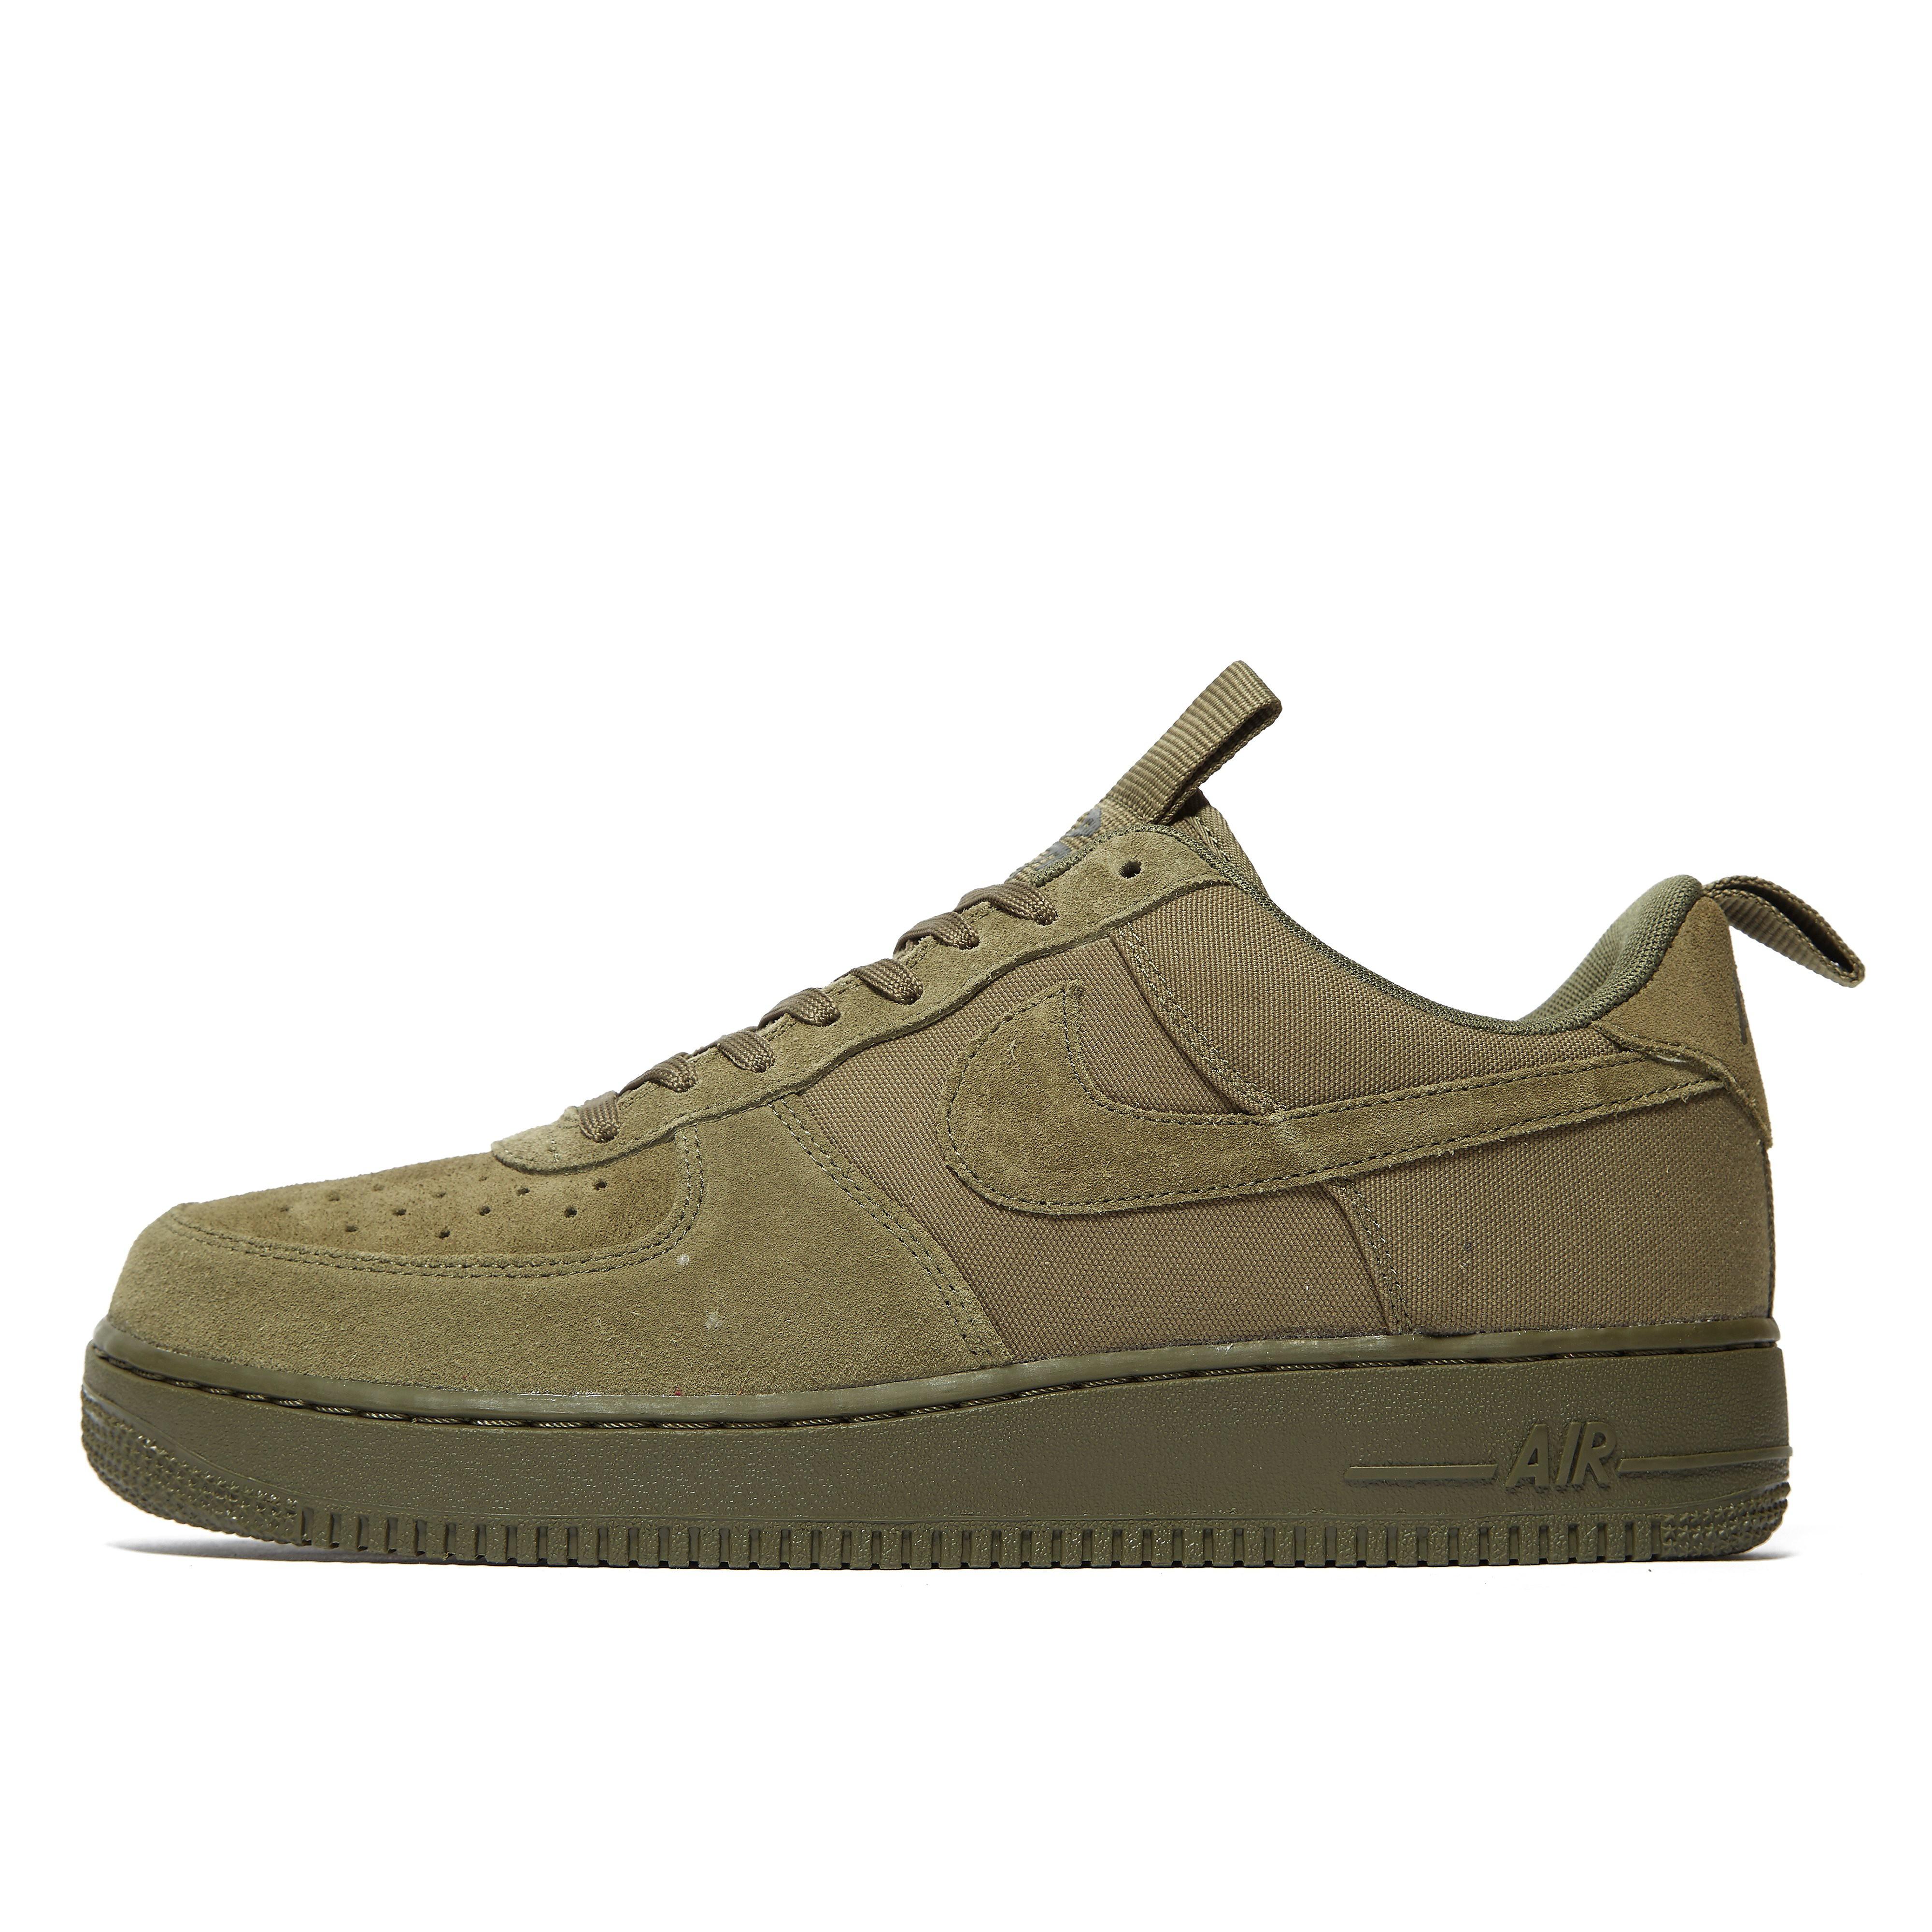 Nike Air Force 1 Canvas Olivgrün